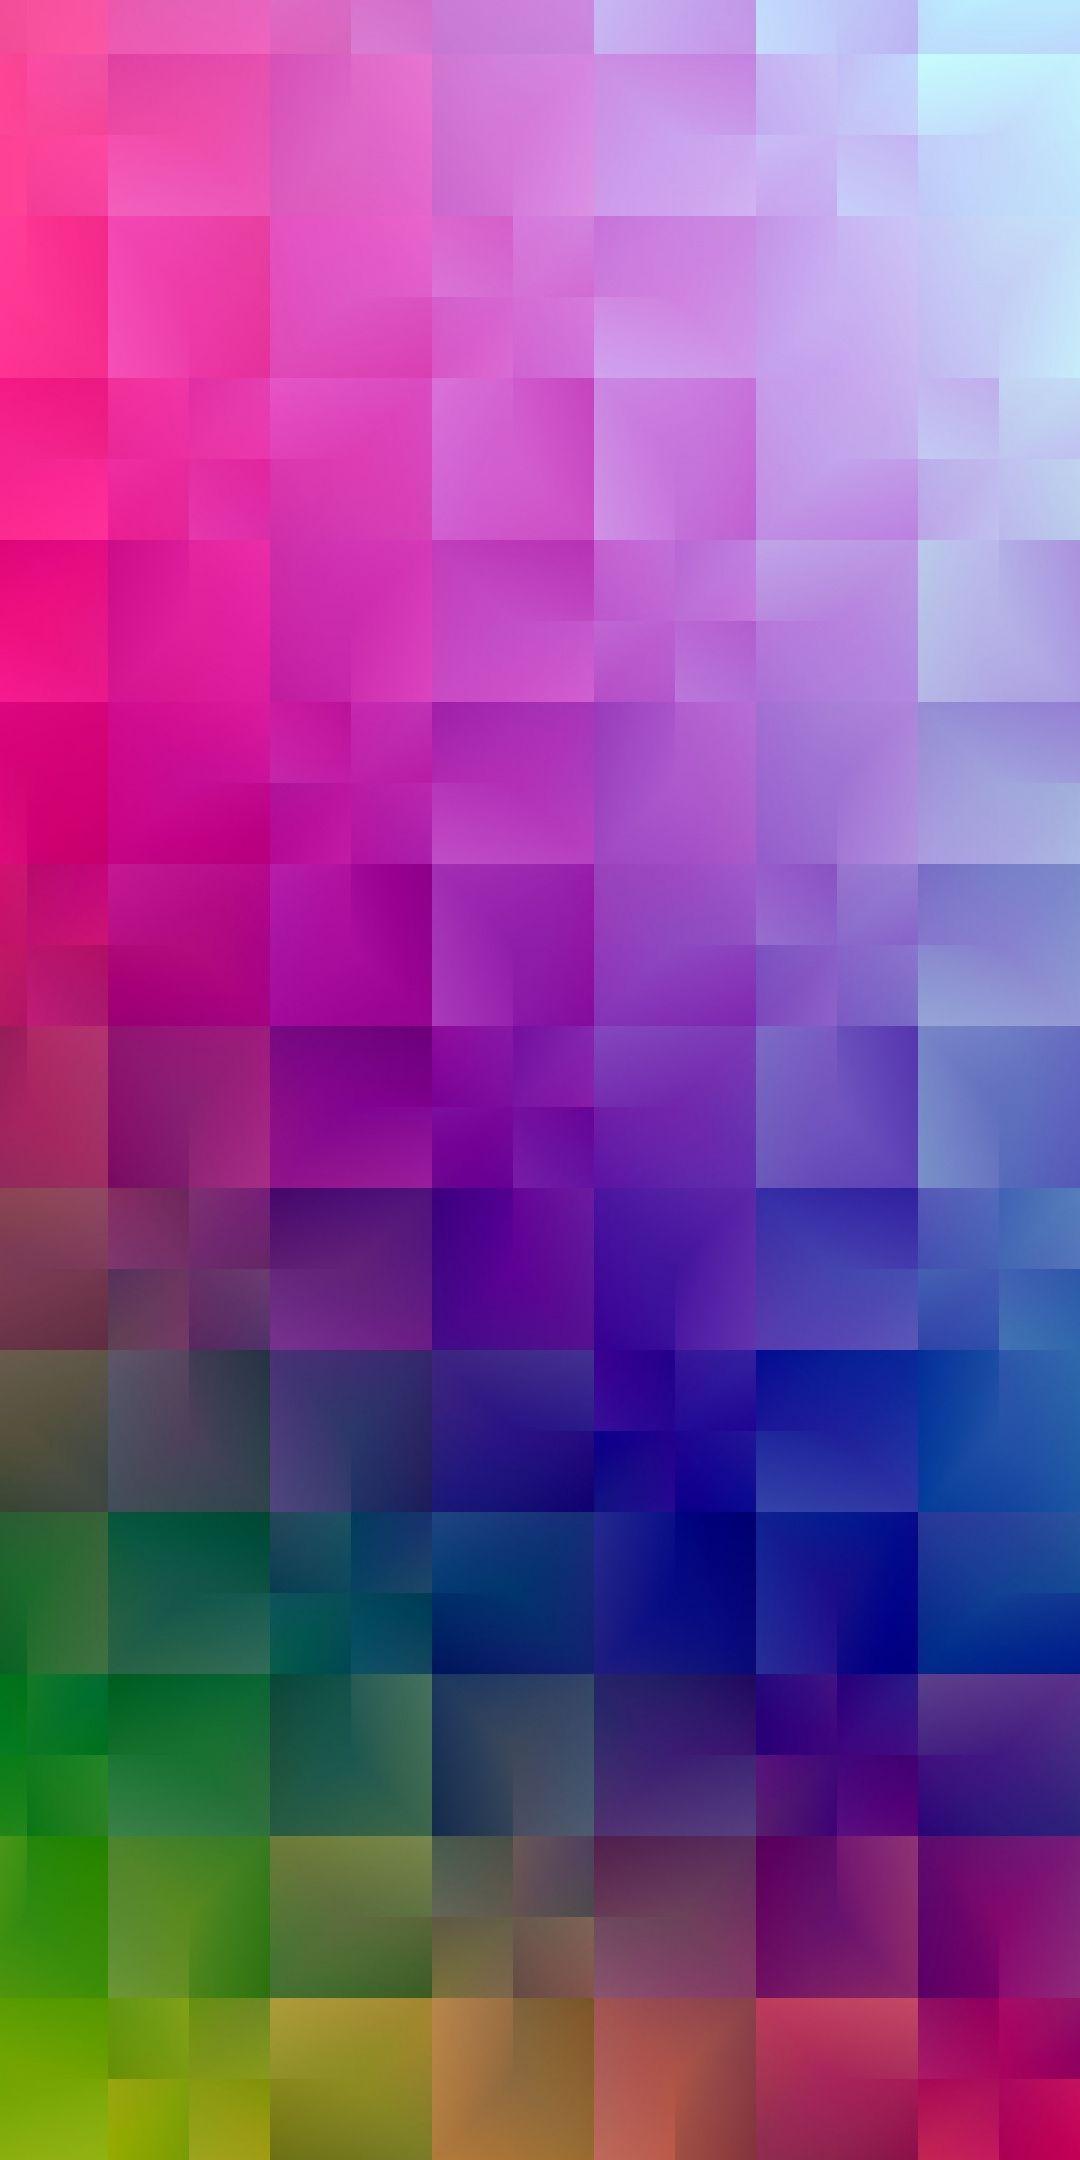 Gradient Colorful Squares 2019 1080x2160 Wallpaper Colorful Wallpaper Apple Wallpaper Rainbow Wallpaper